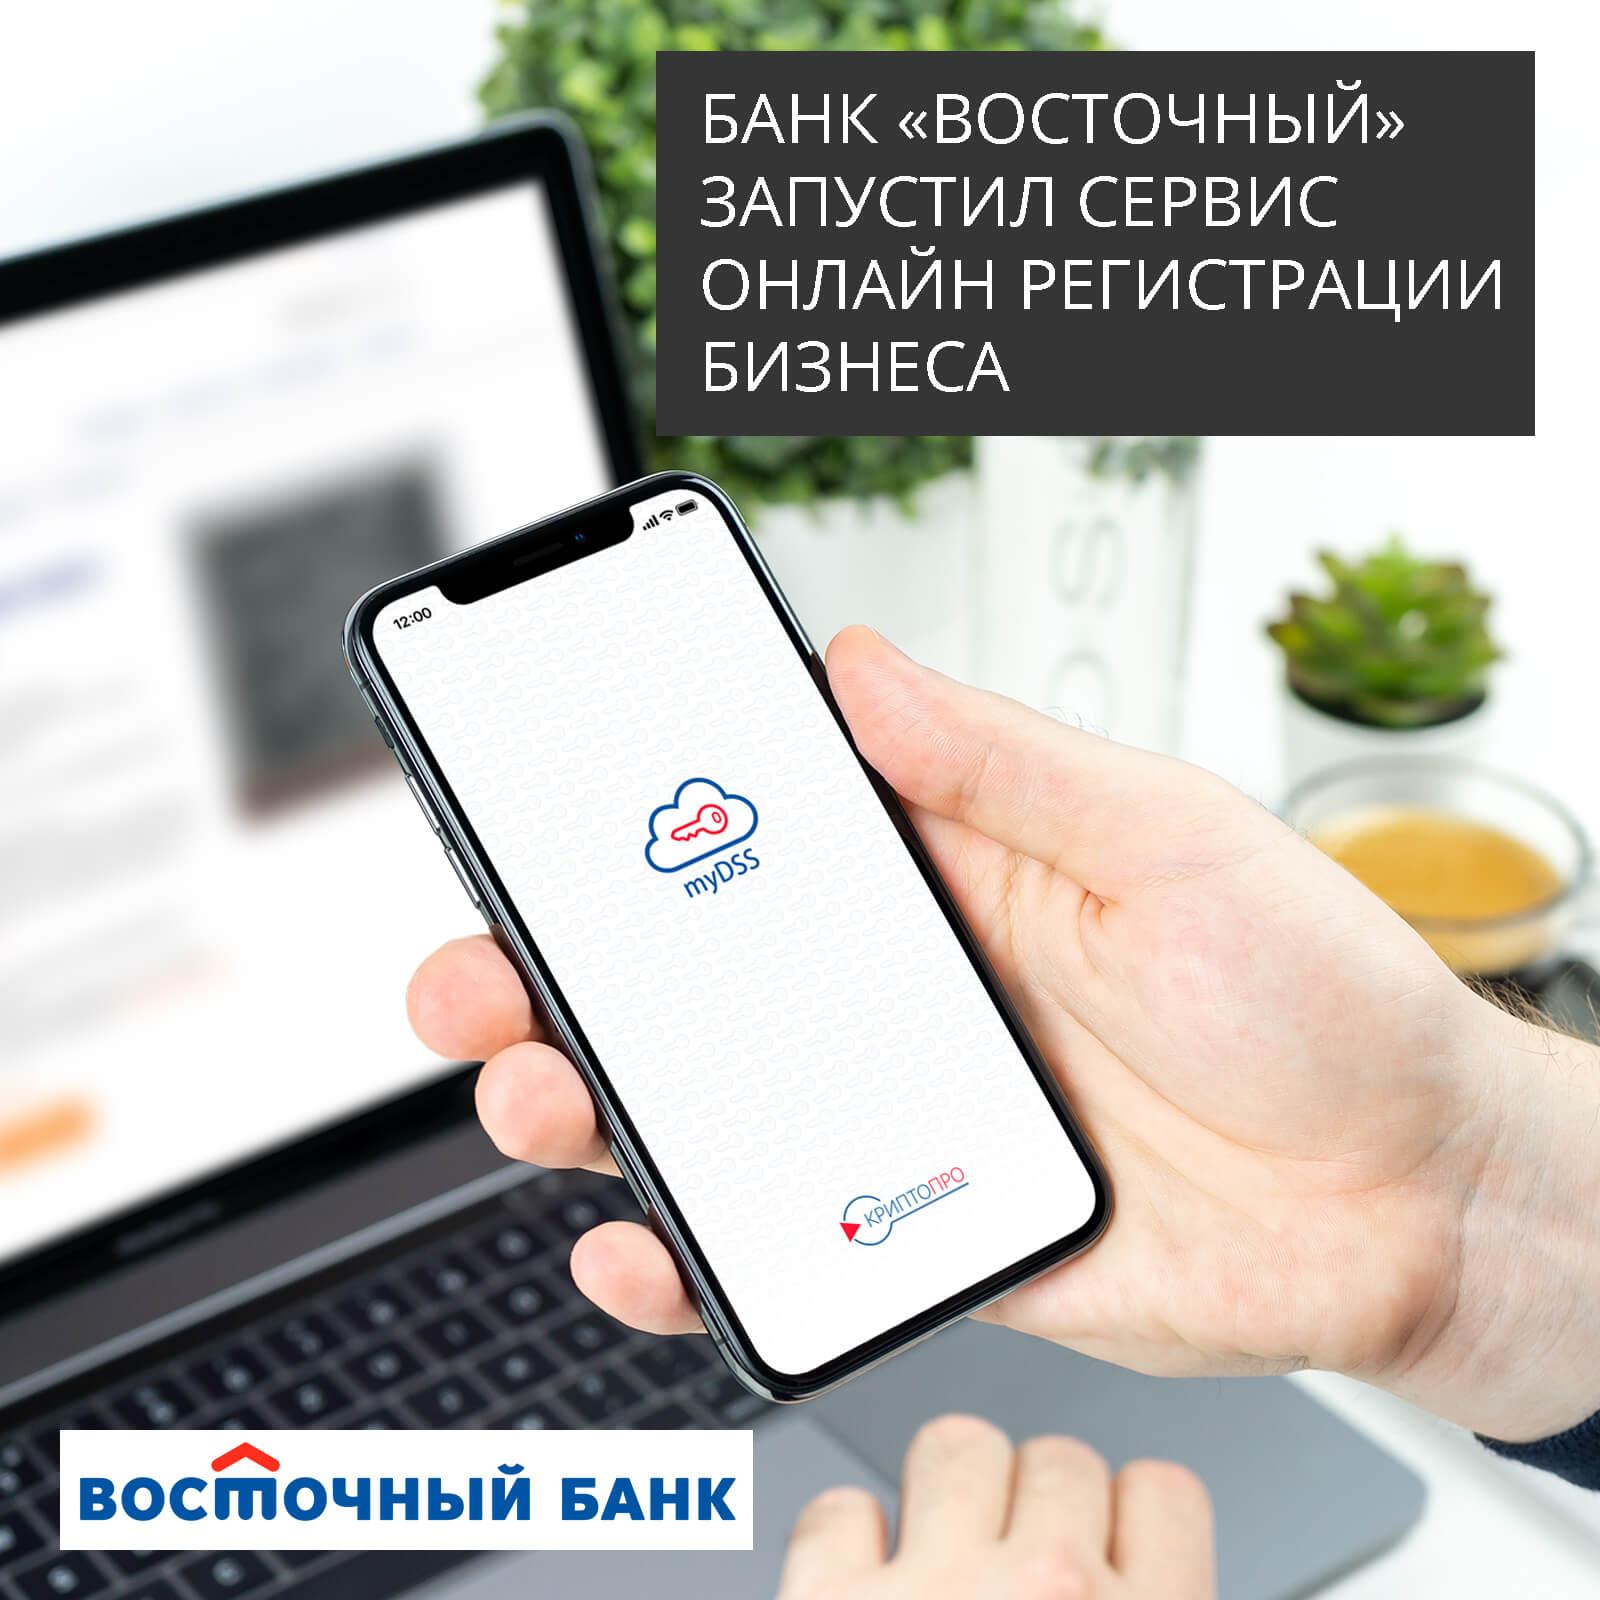 vostbank ru кредит онлайн